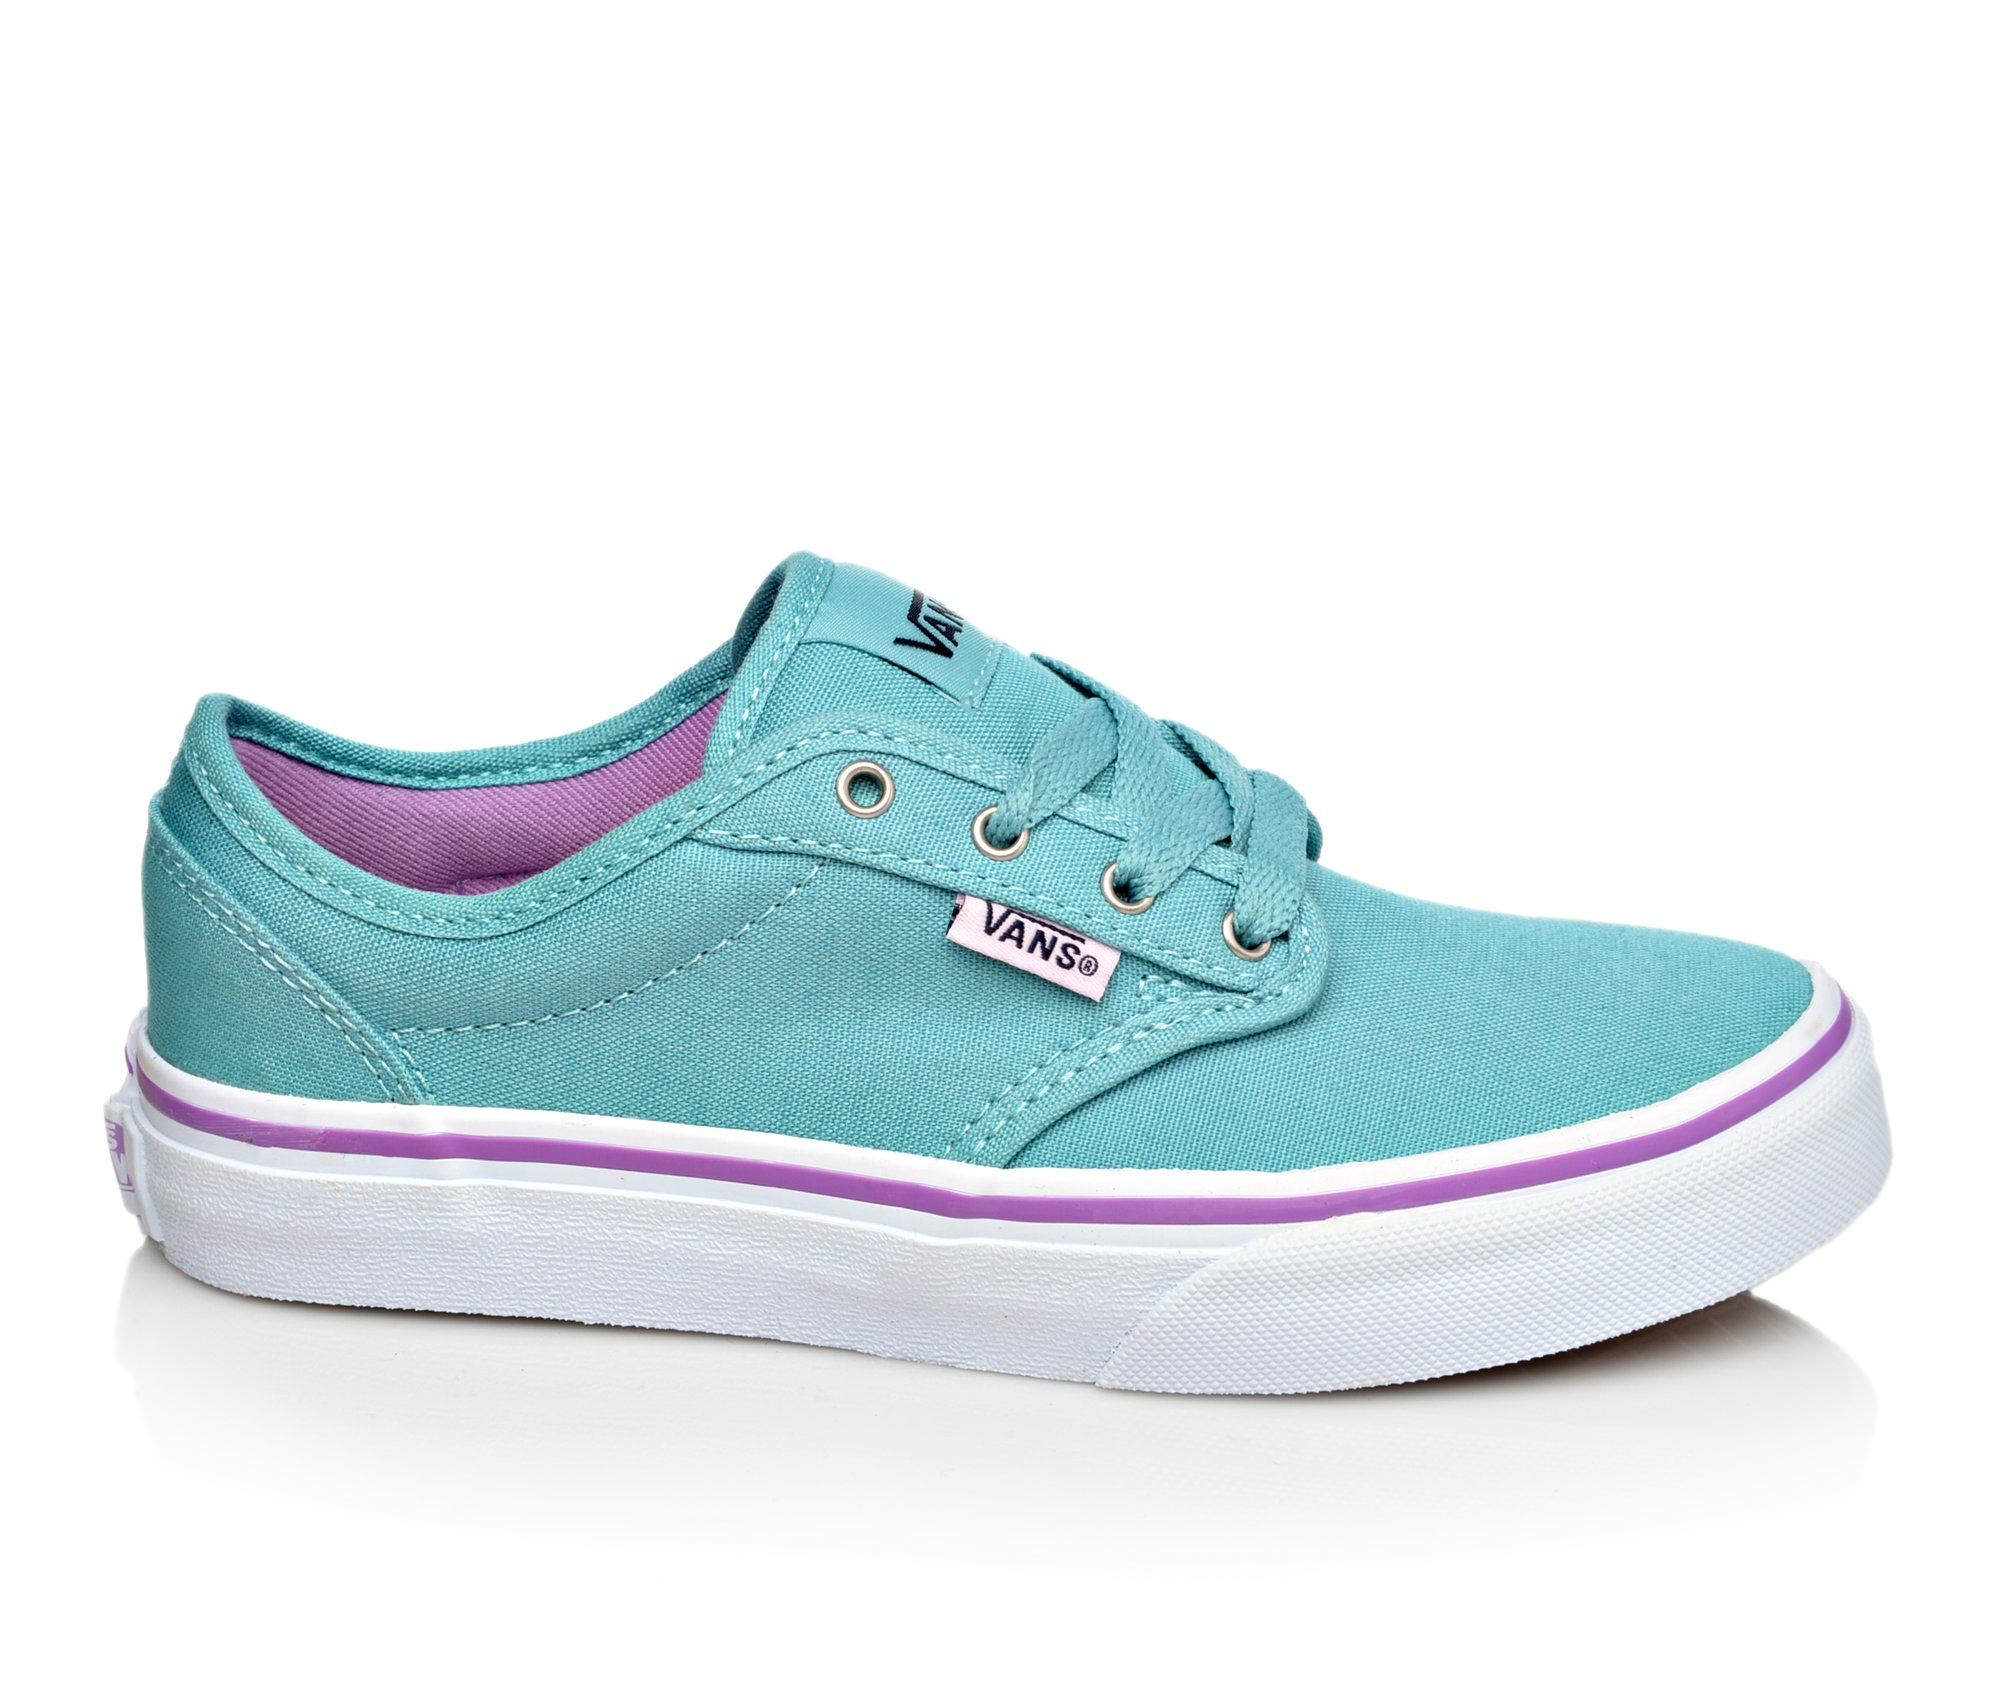 Girls' Vans Atwood G Skate Shoes (Blue)